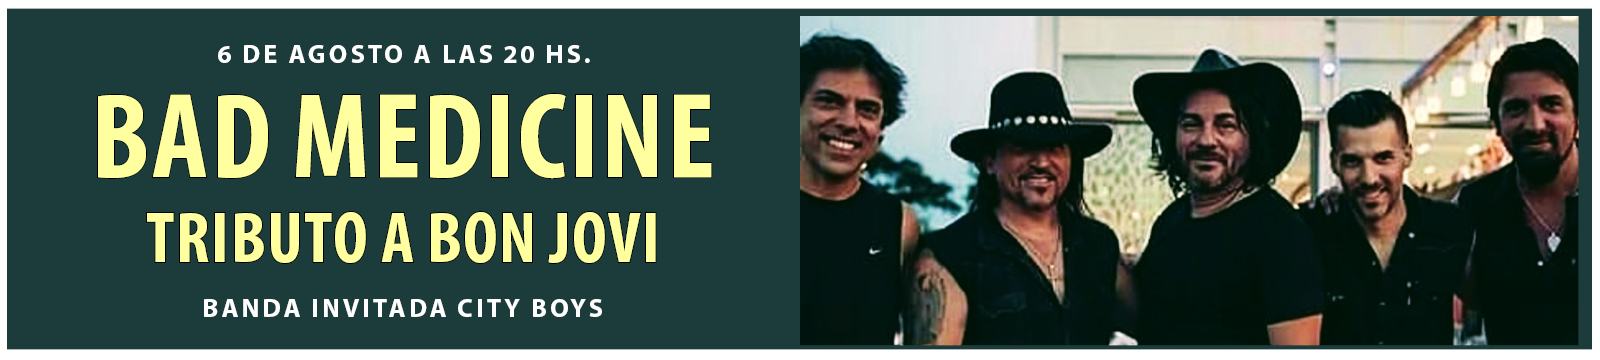 Bad Medicine, tributo a Bon Jovi